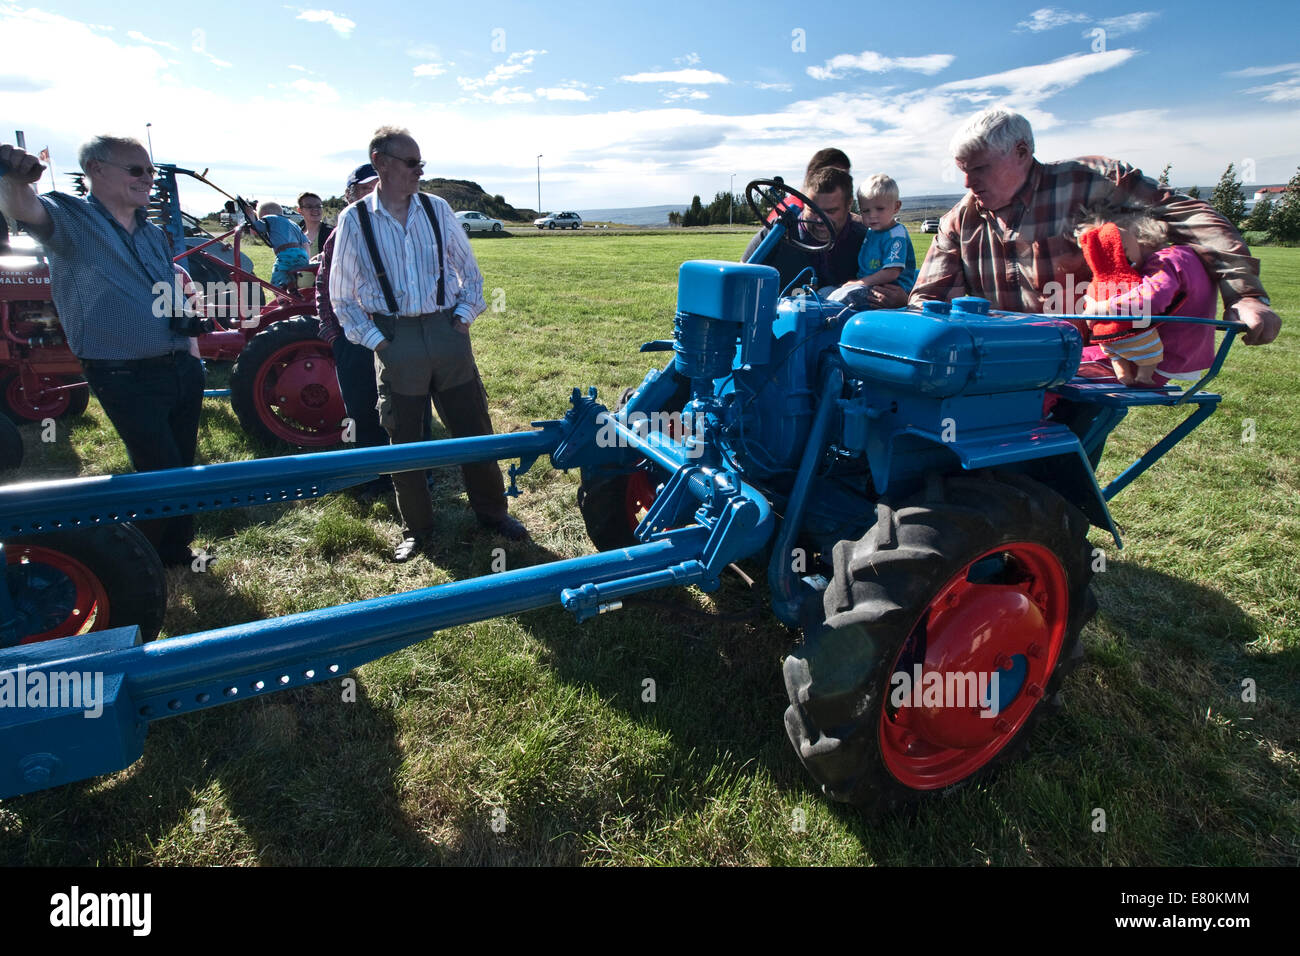 Agricultural Fair in Egilsstadir, Iceland Stock Photo